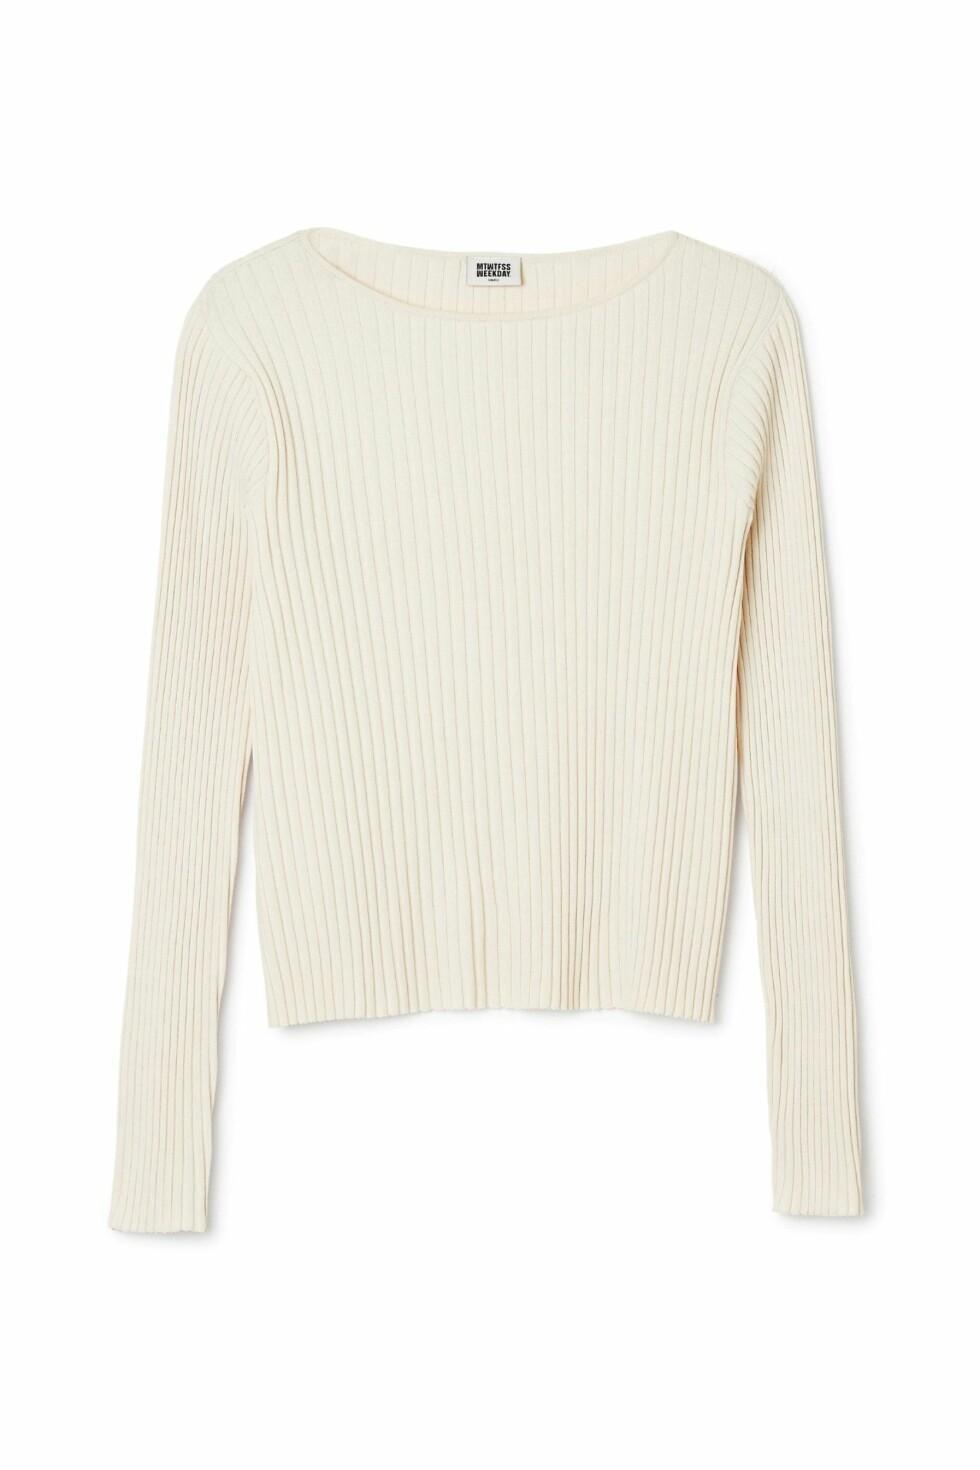 Genser fra Weekday | kr 300 | http://shop.weekday.com/se/Womens_shop/Knitwear/Turl_Jumper/542442-6490956.1#c-49930